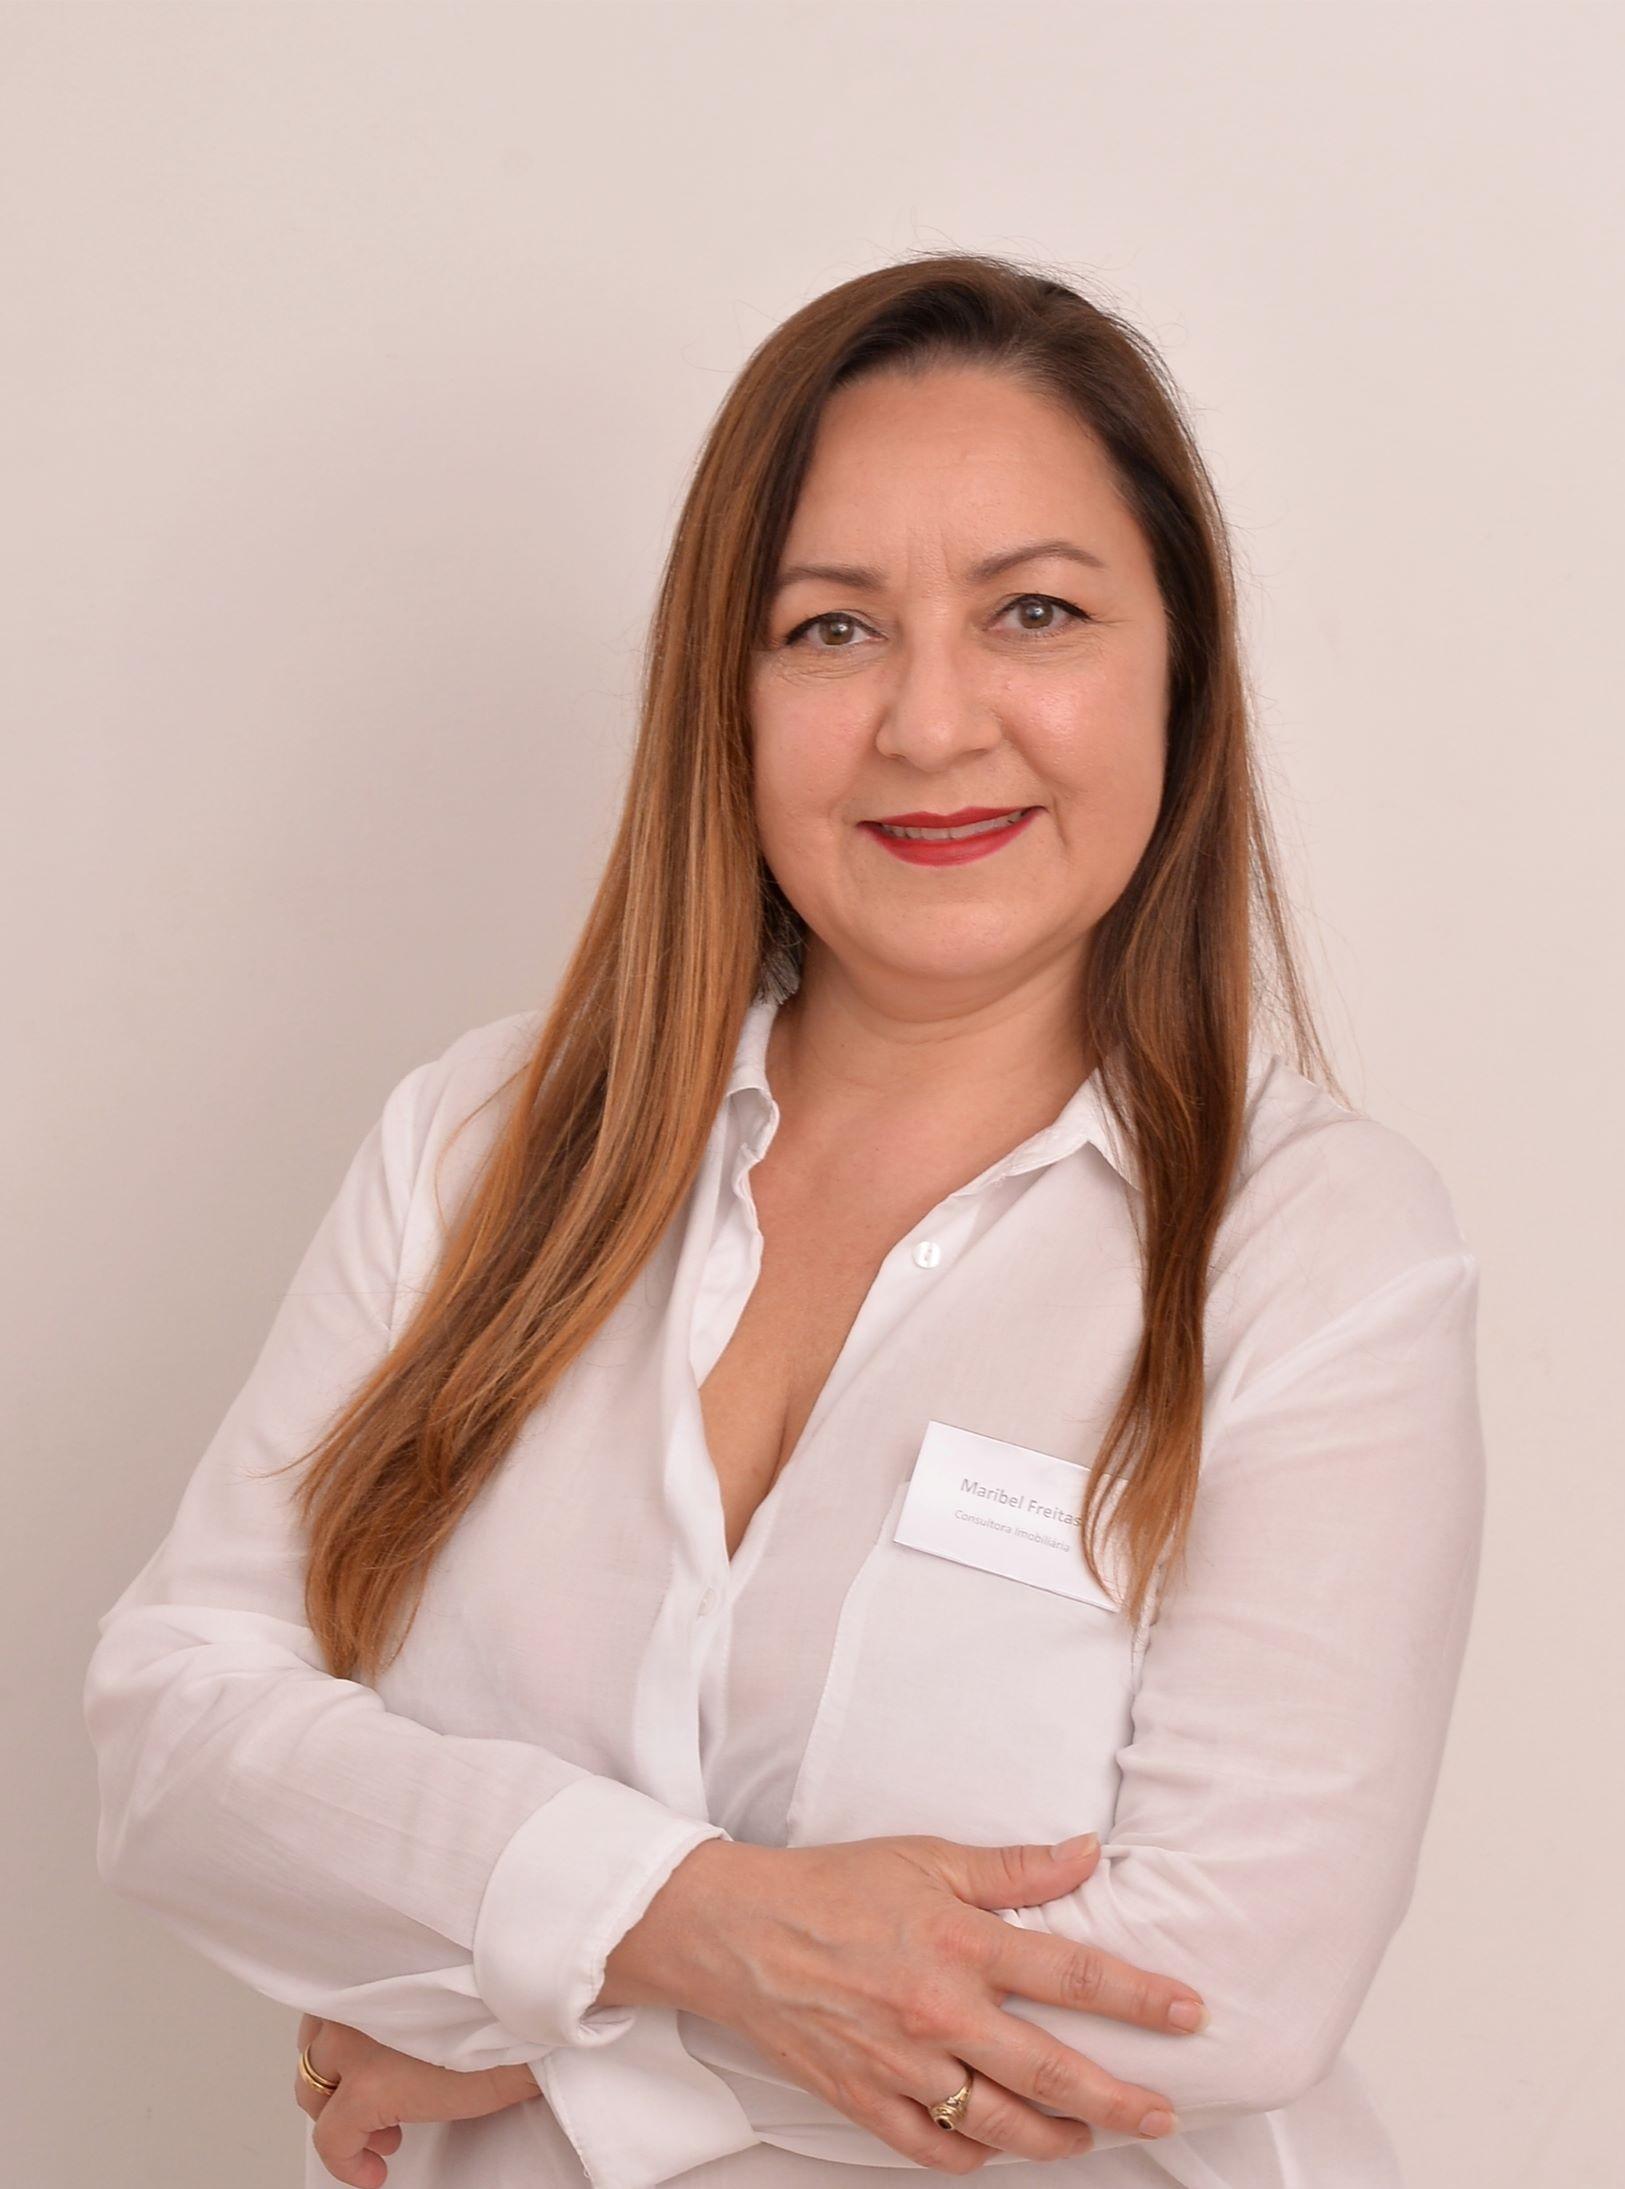 Maribel Freitas